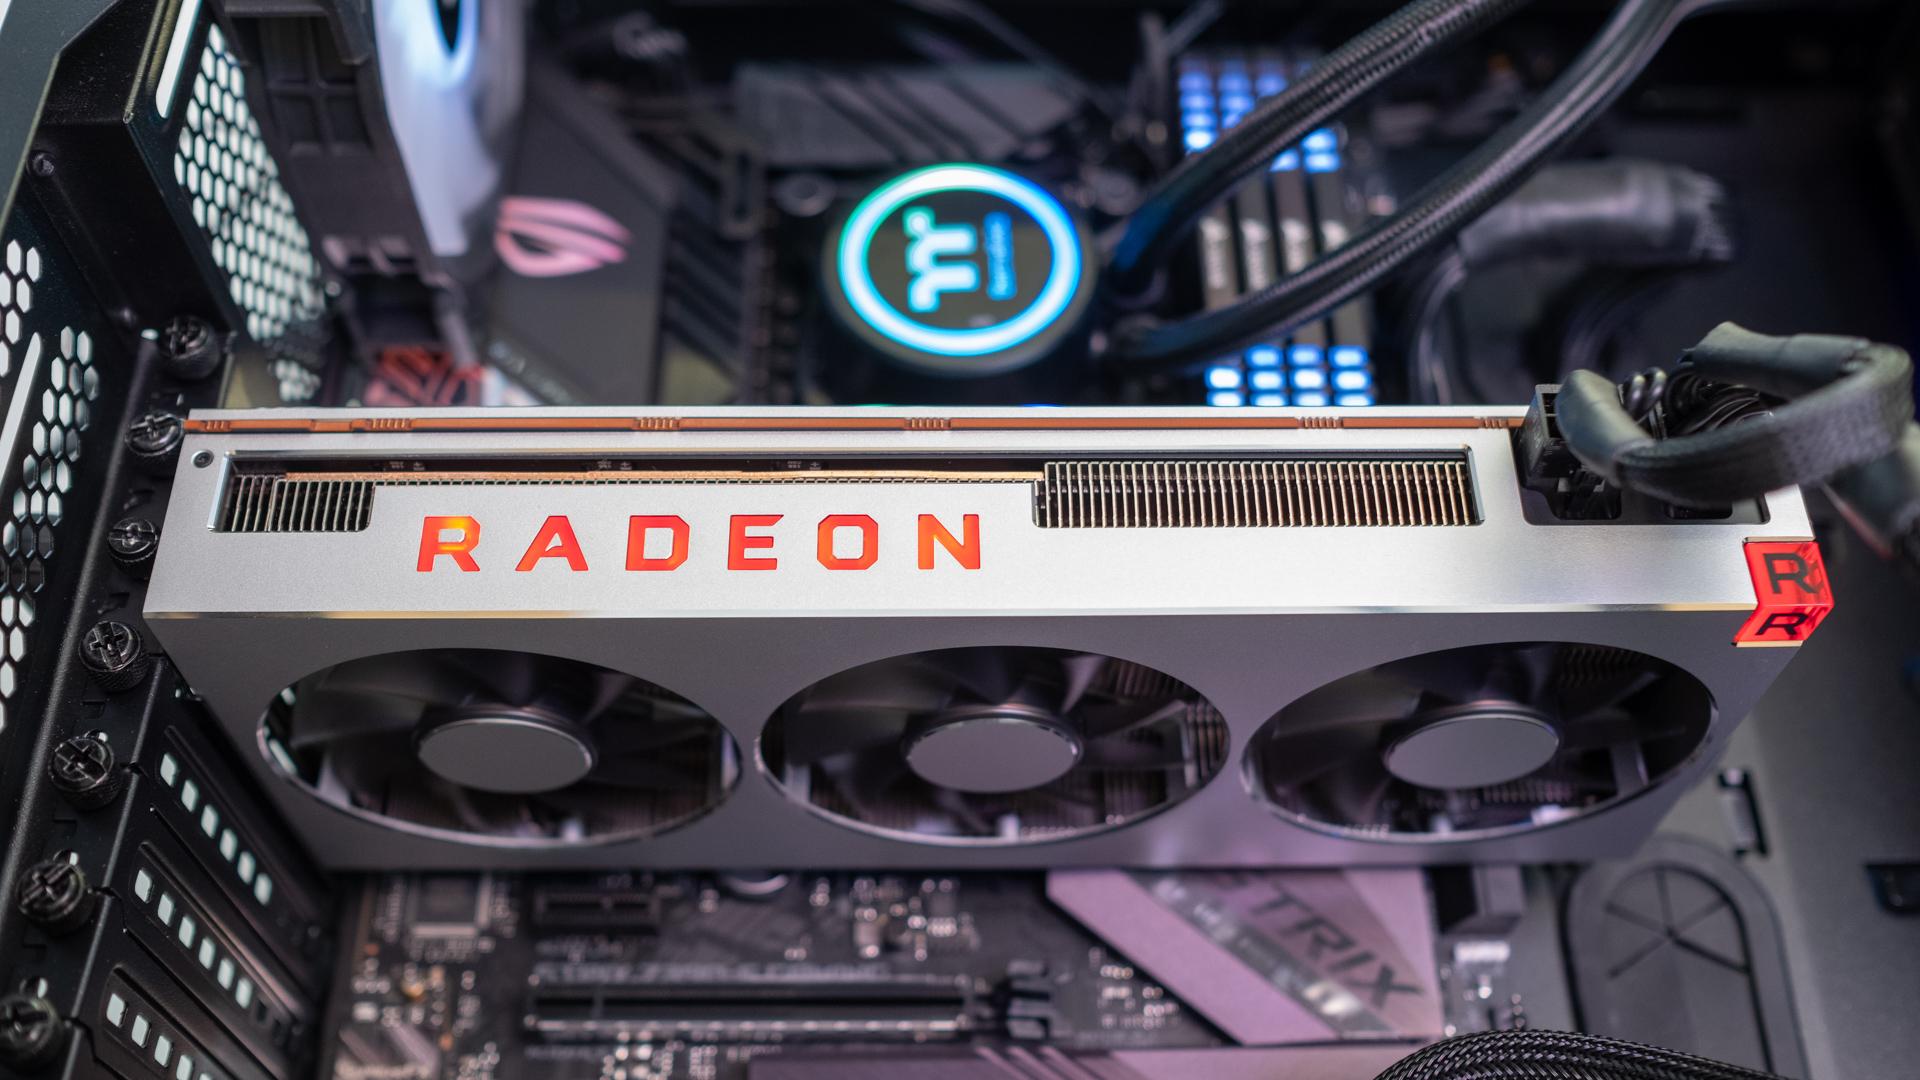 Amd Radeon Vii Review Techradar